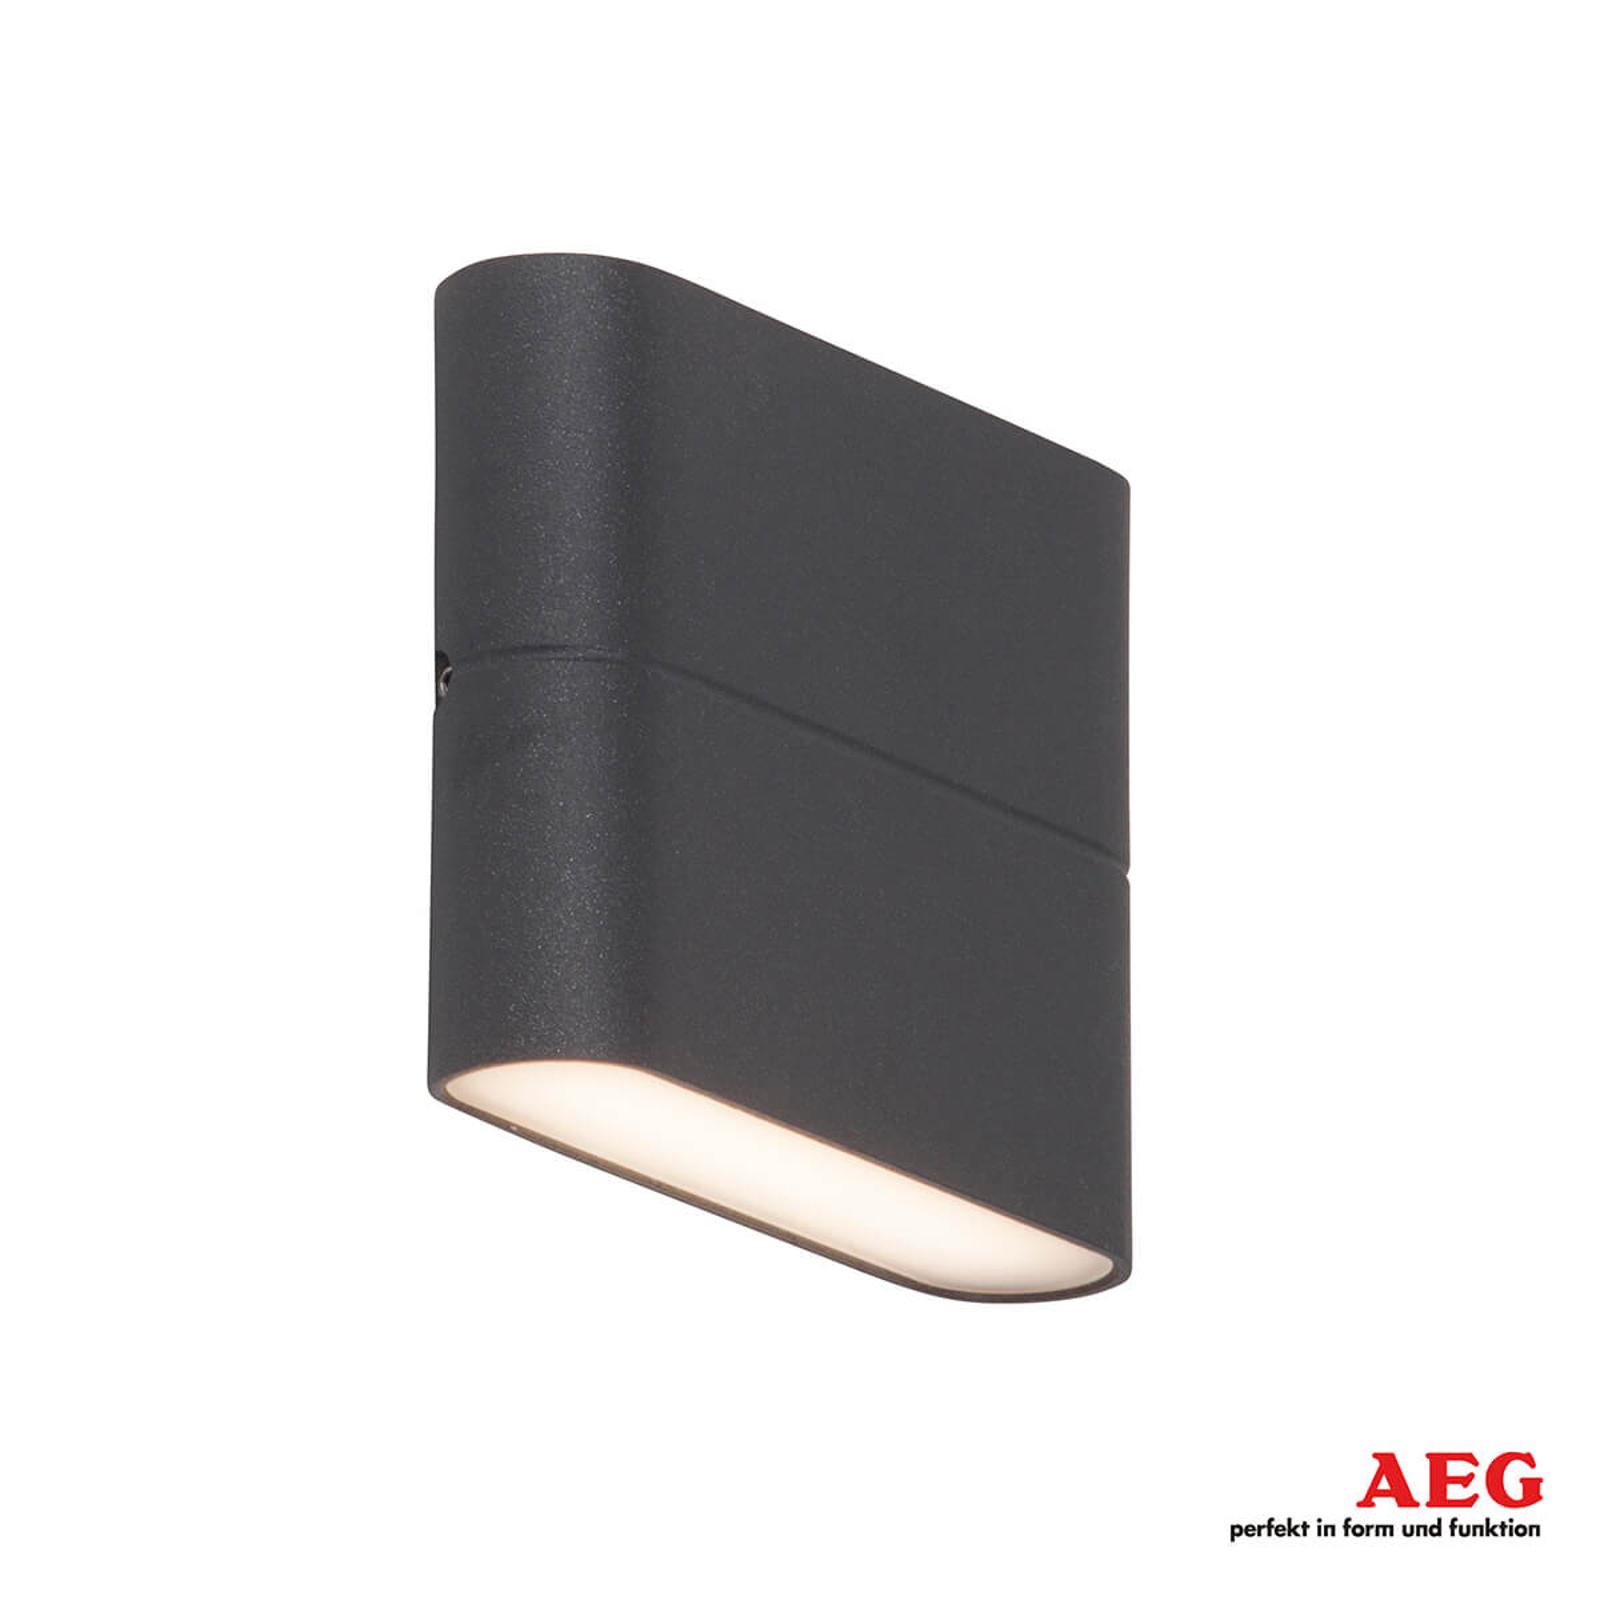 AEG Telesto - LED-Außenwandlampe 11,5 cm breit